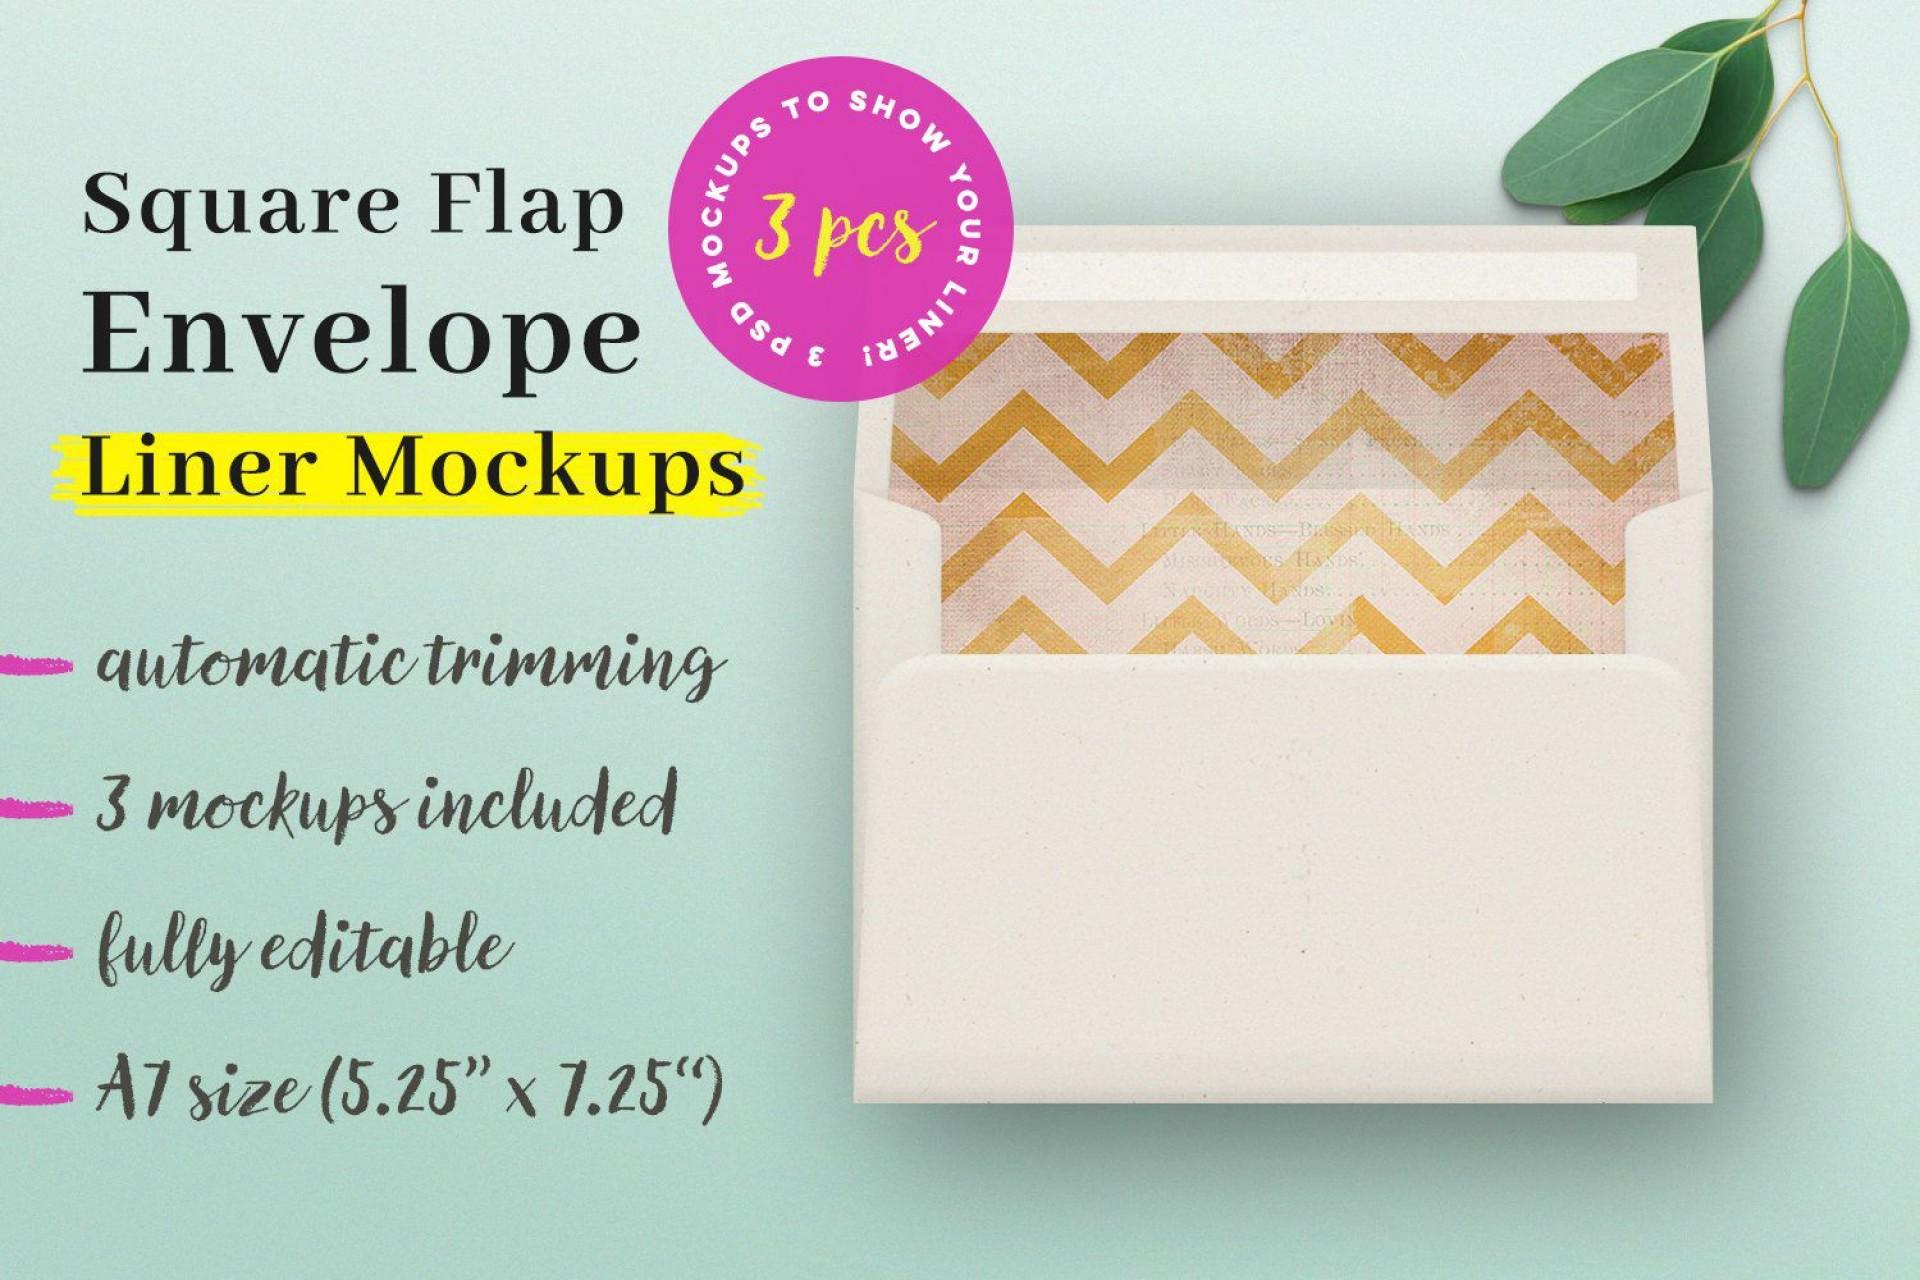 009 Unique A7 Envelope Liner Template Square Flap High Resolution 1920